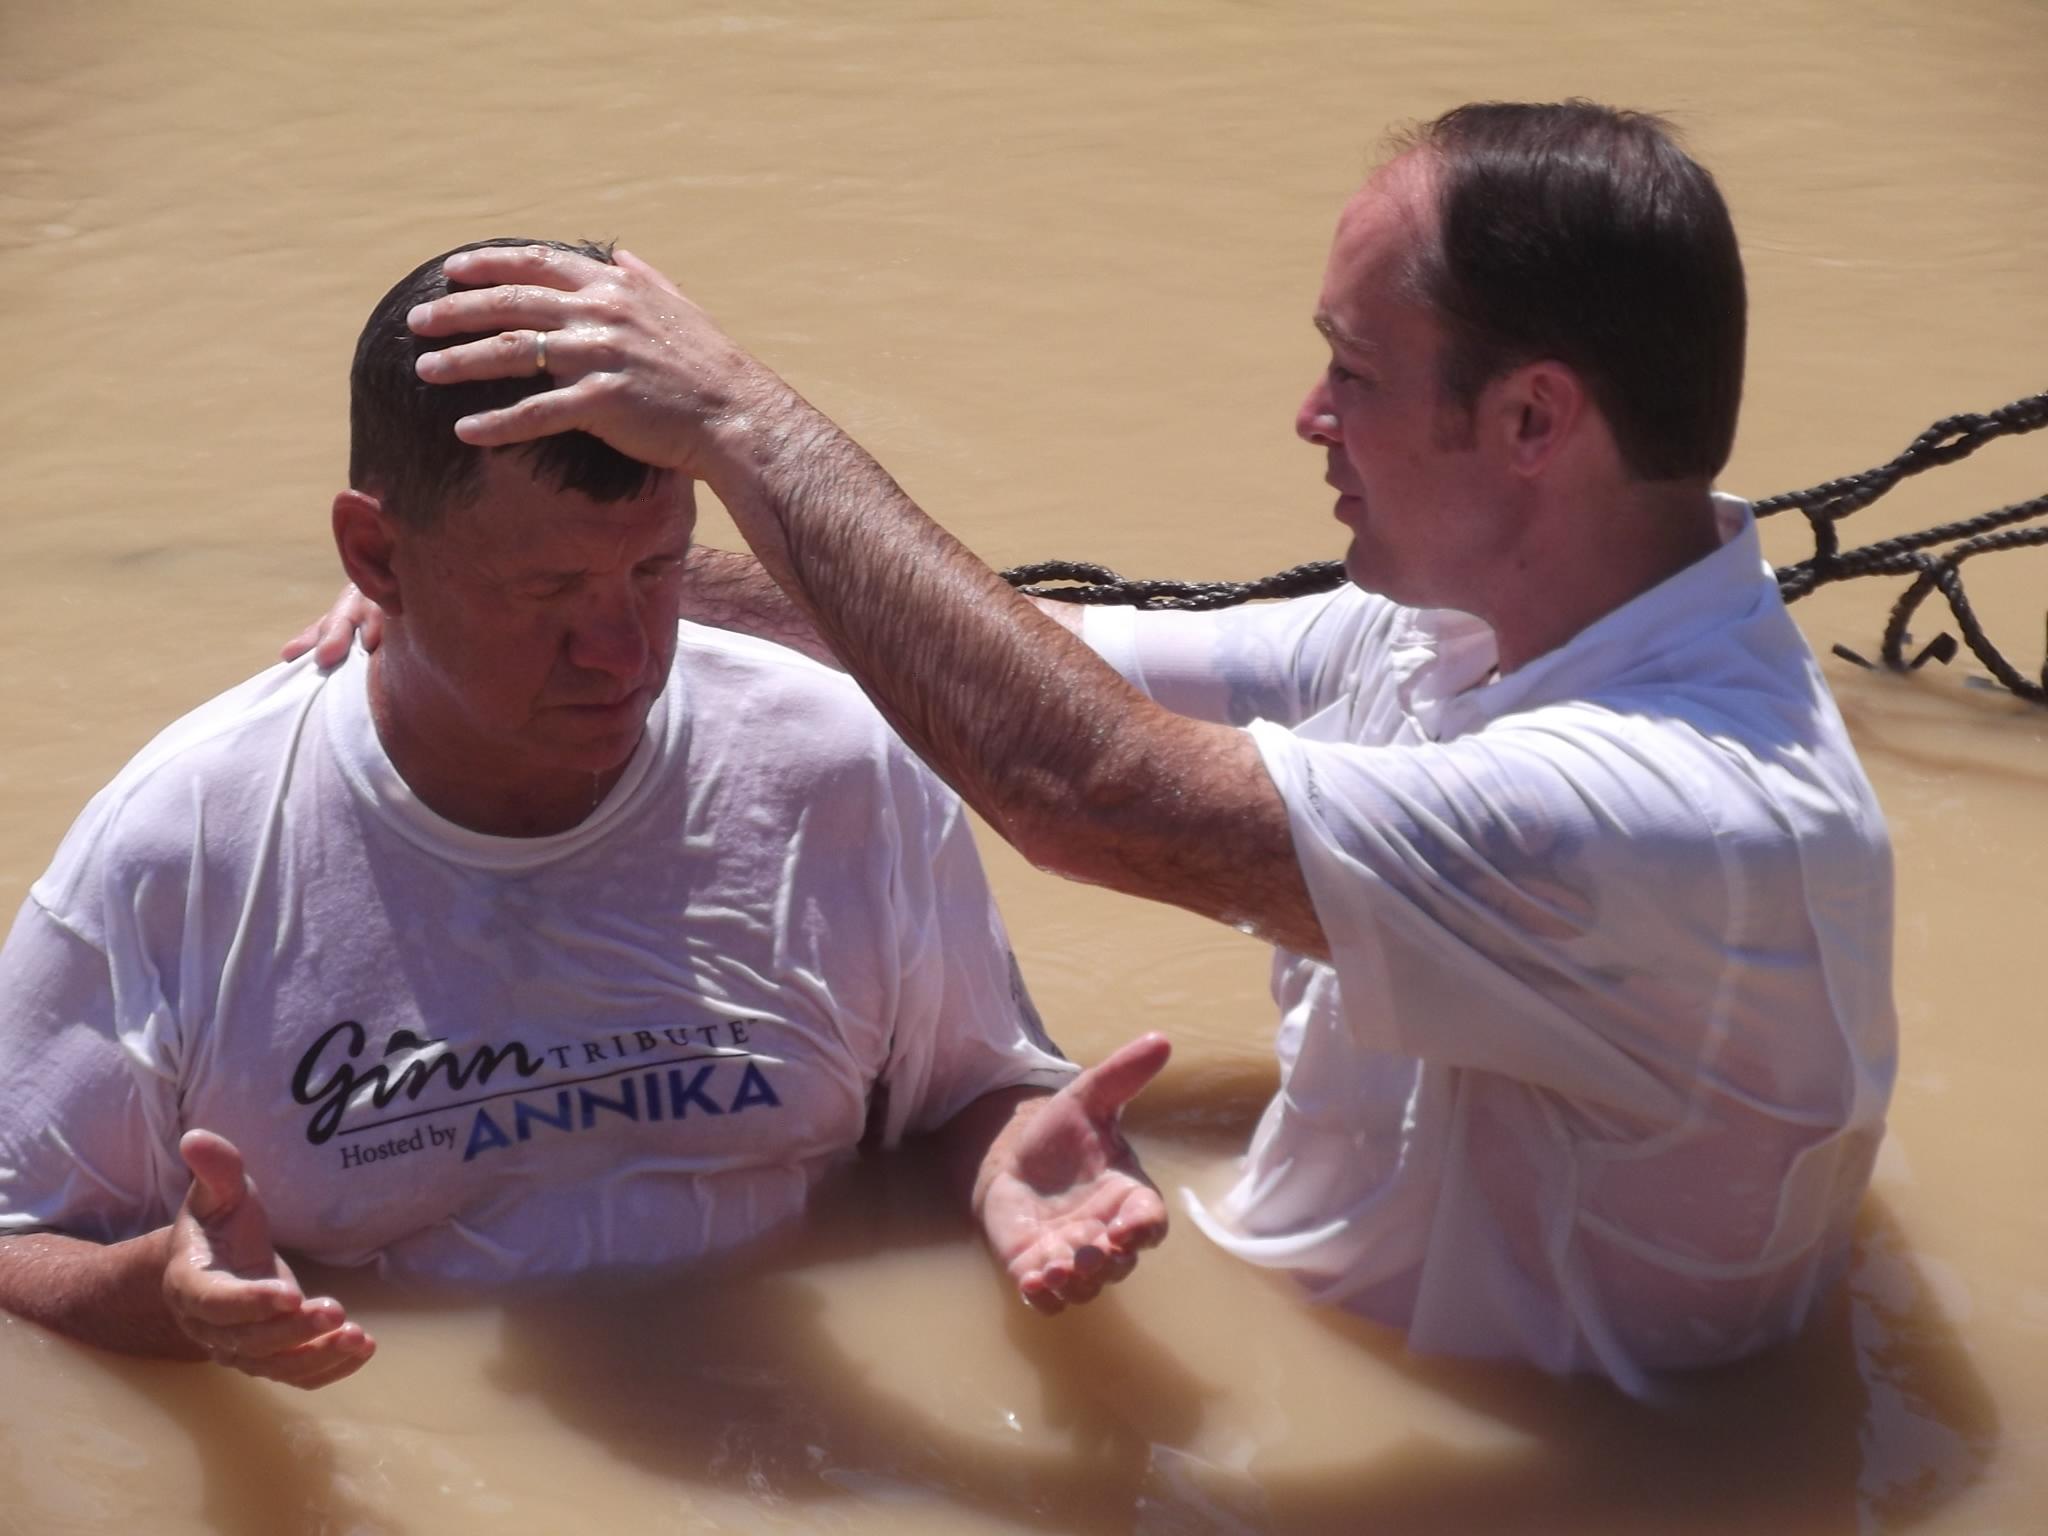 Pastor Jerry Renewing His Baptismal Covenant in the Jordan River